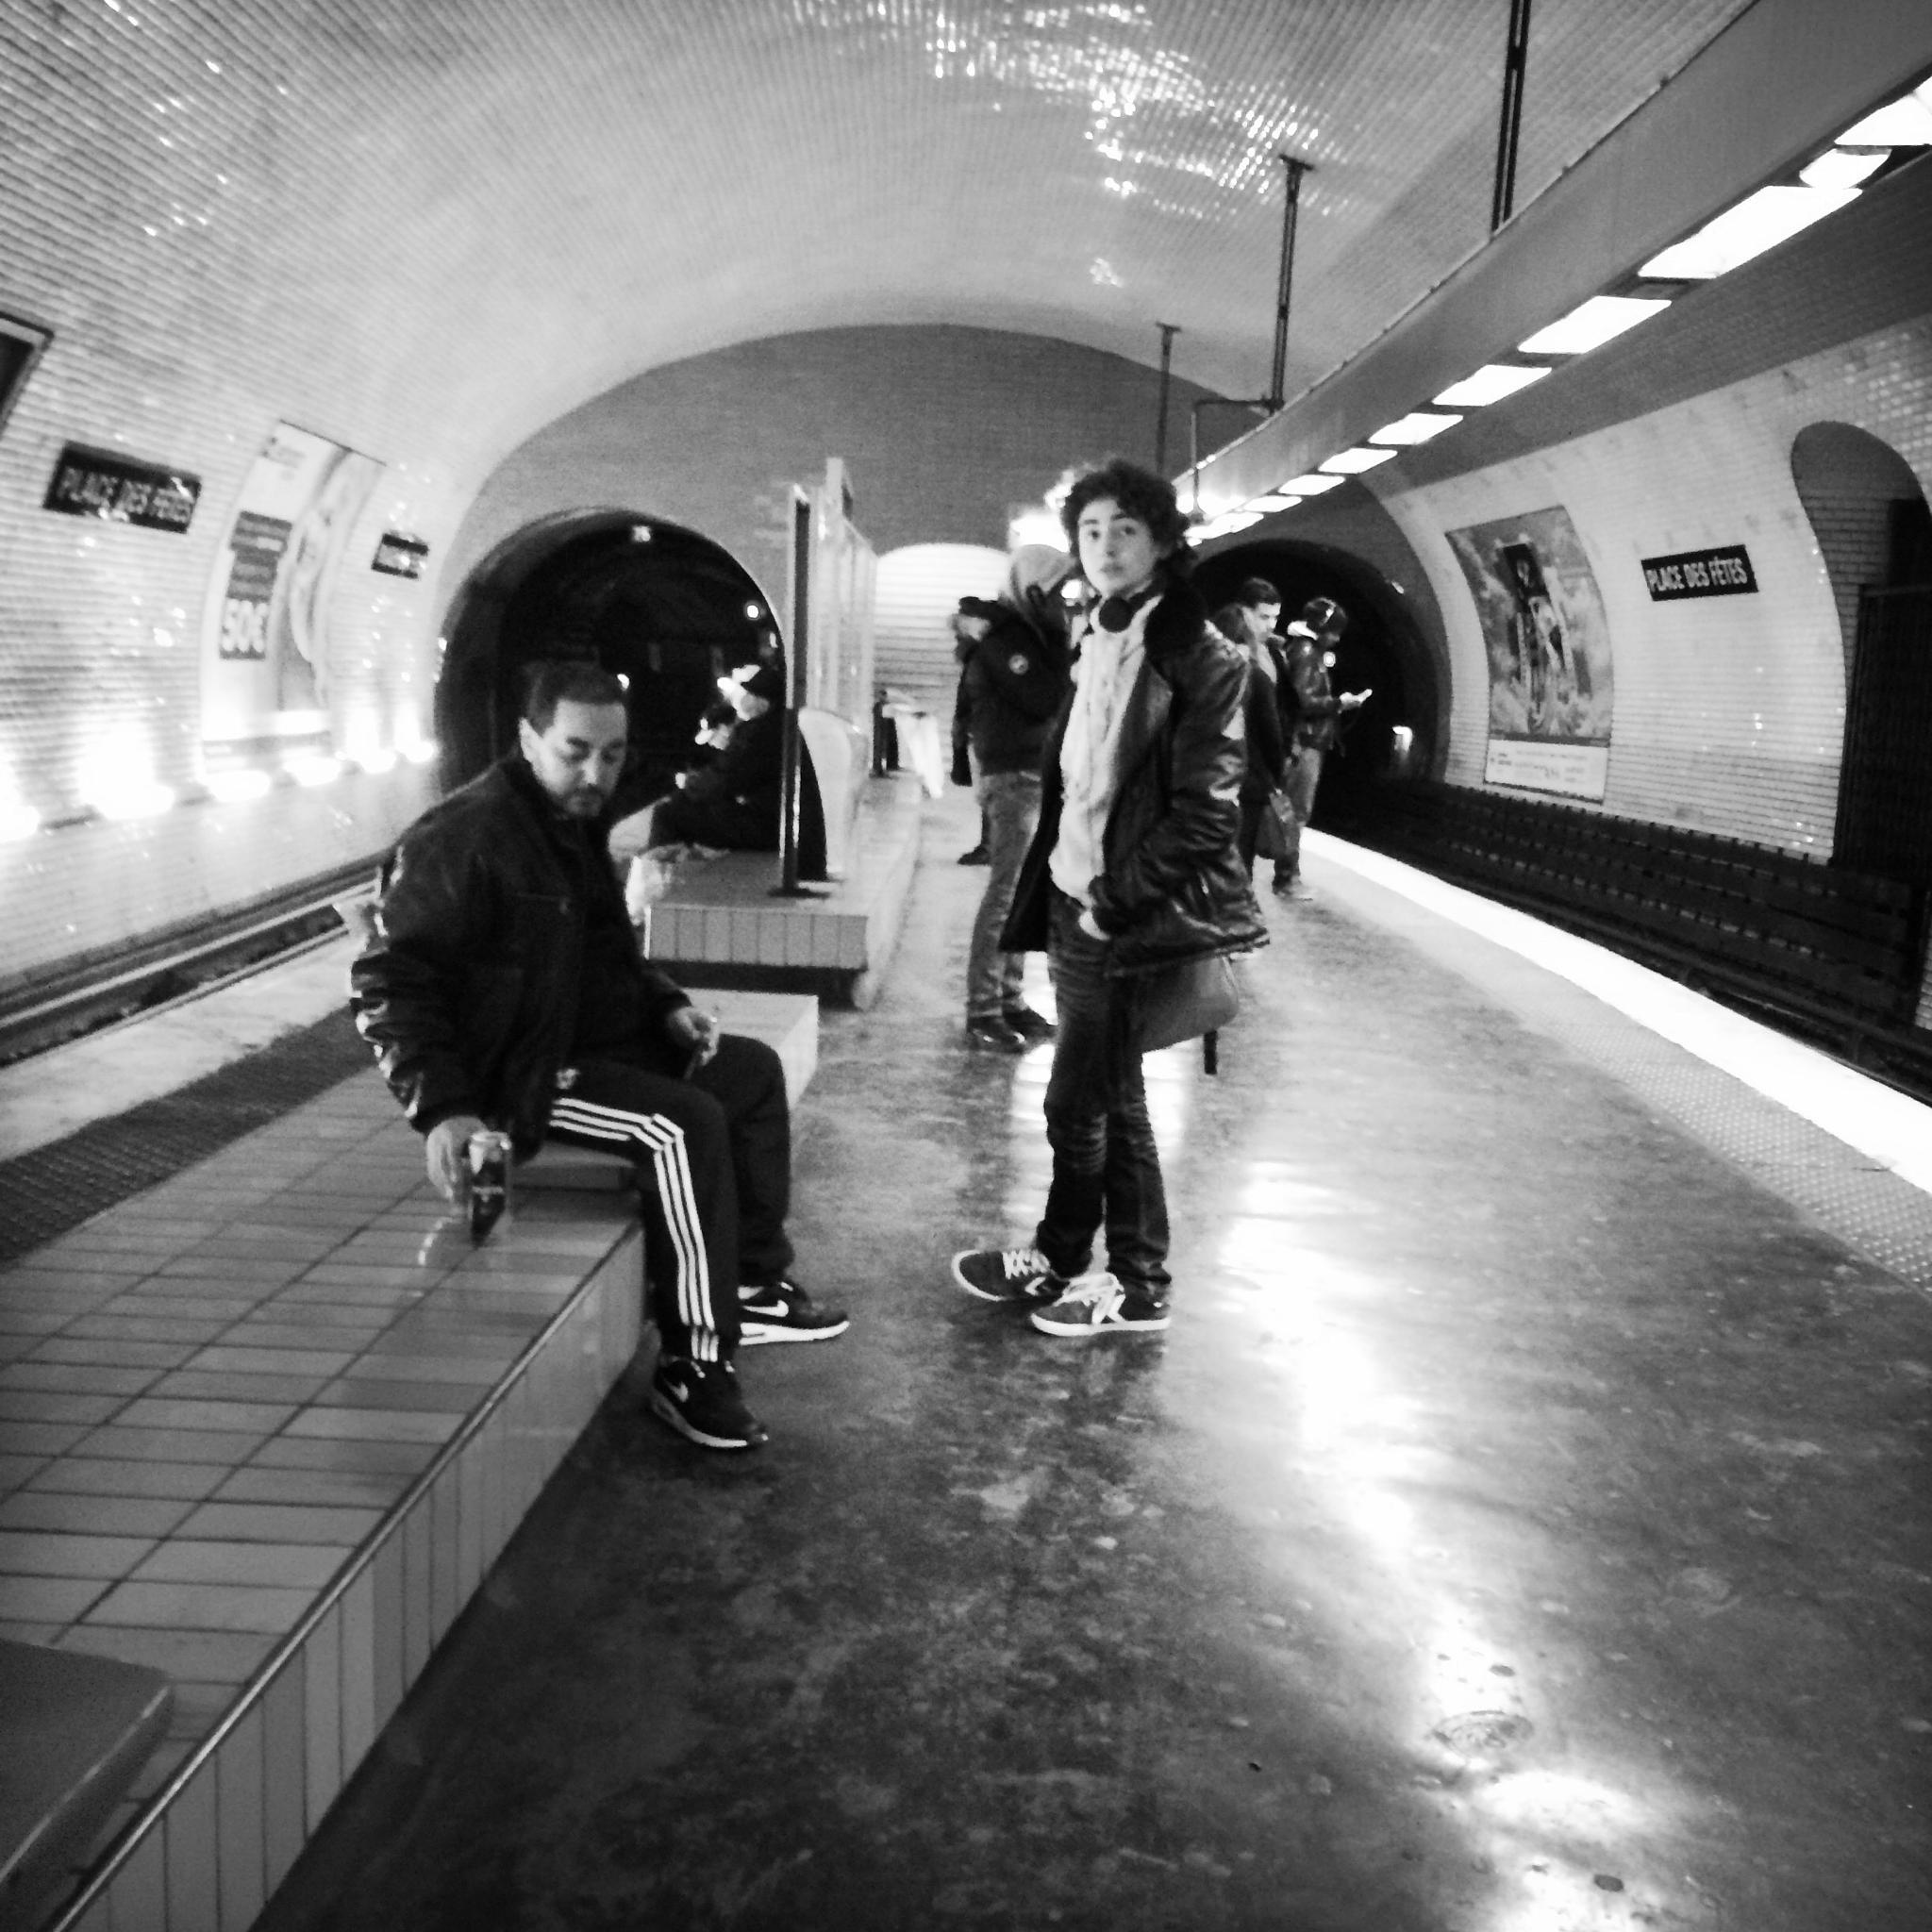 Metro refreshments by parisfind